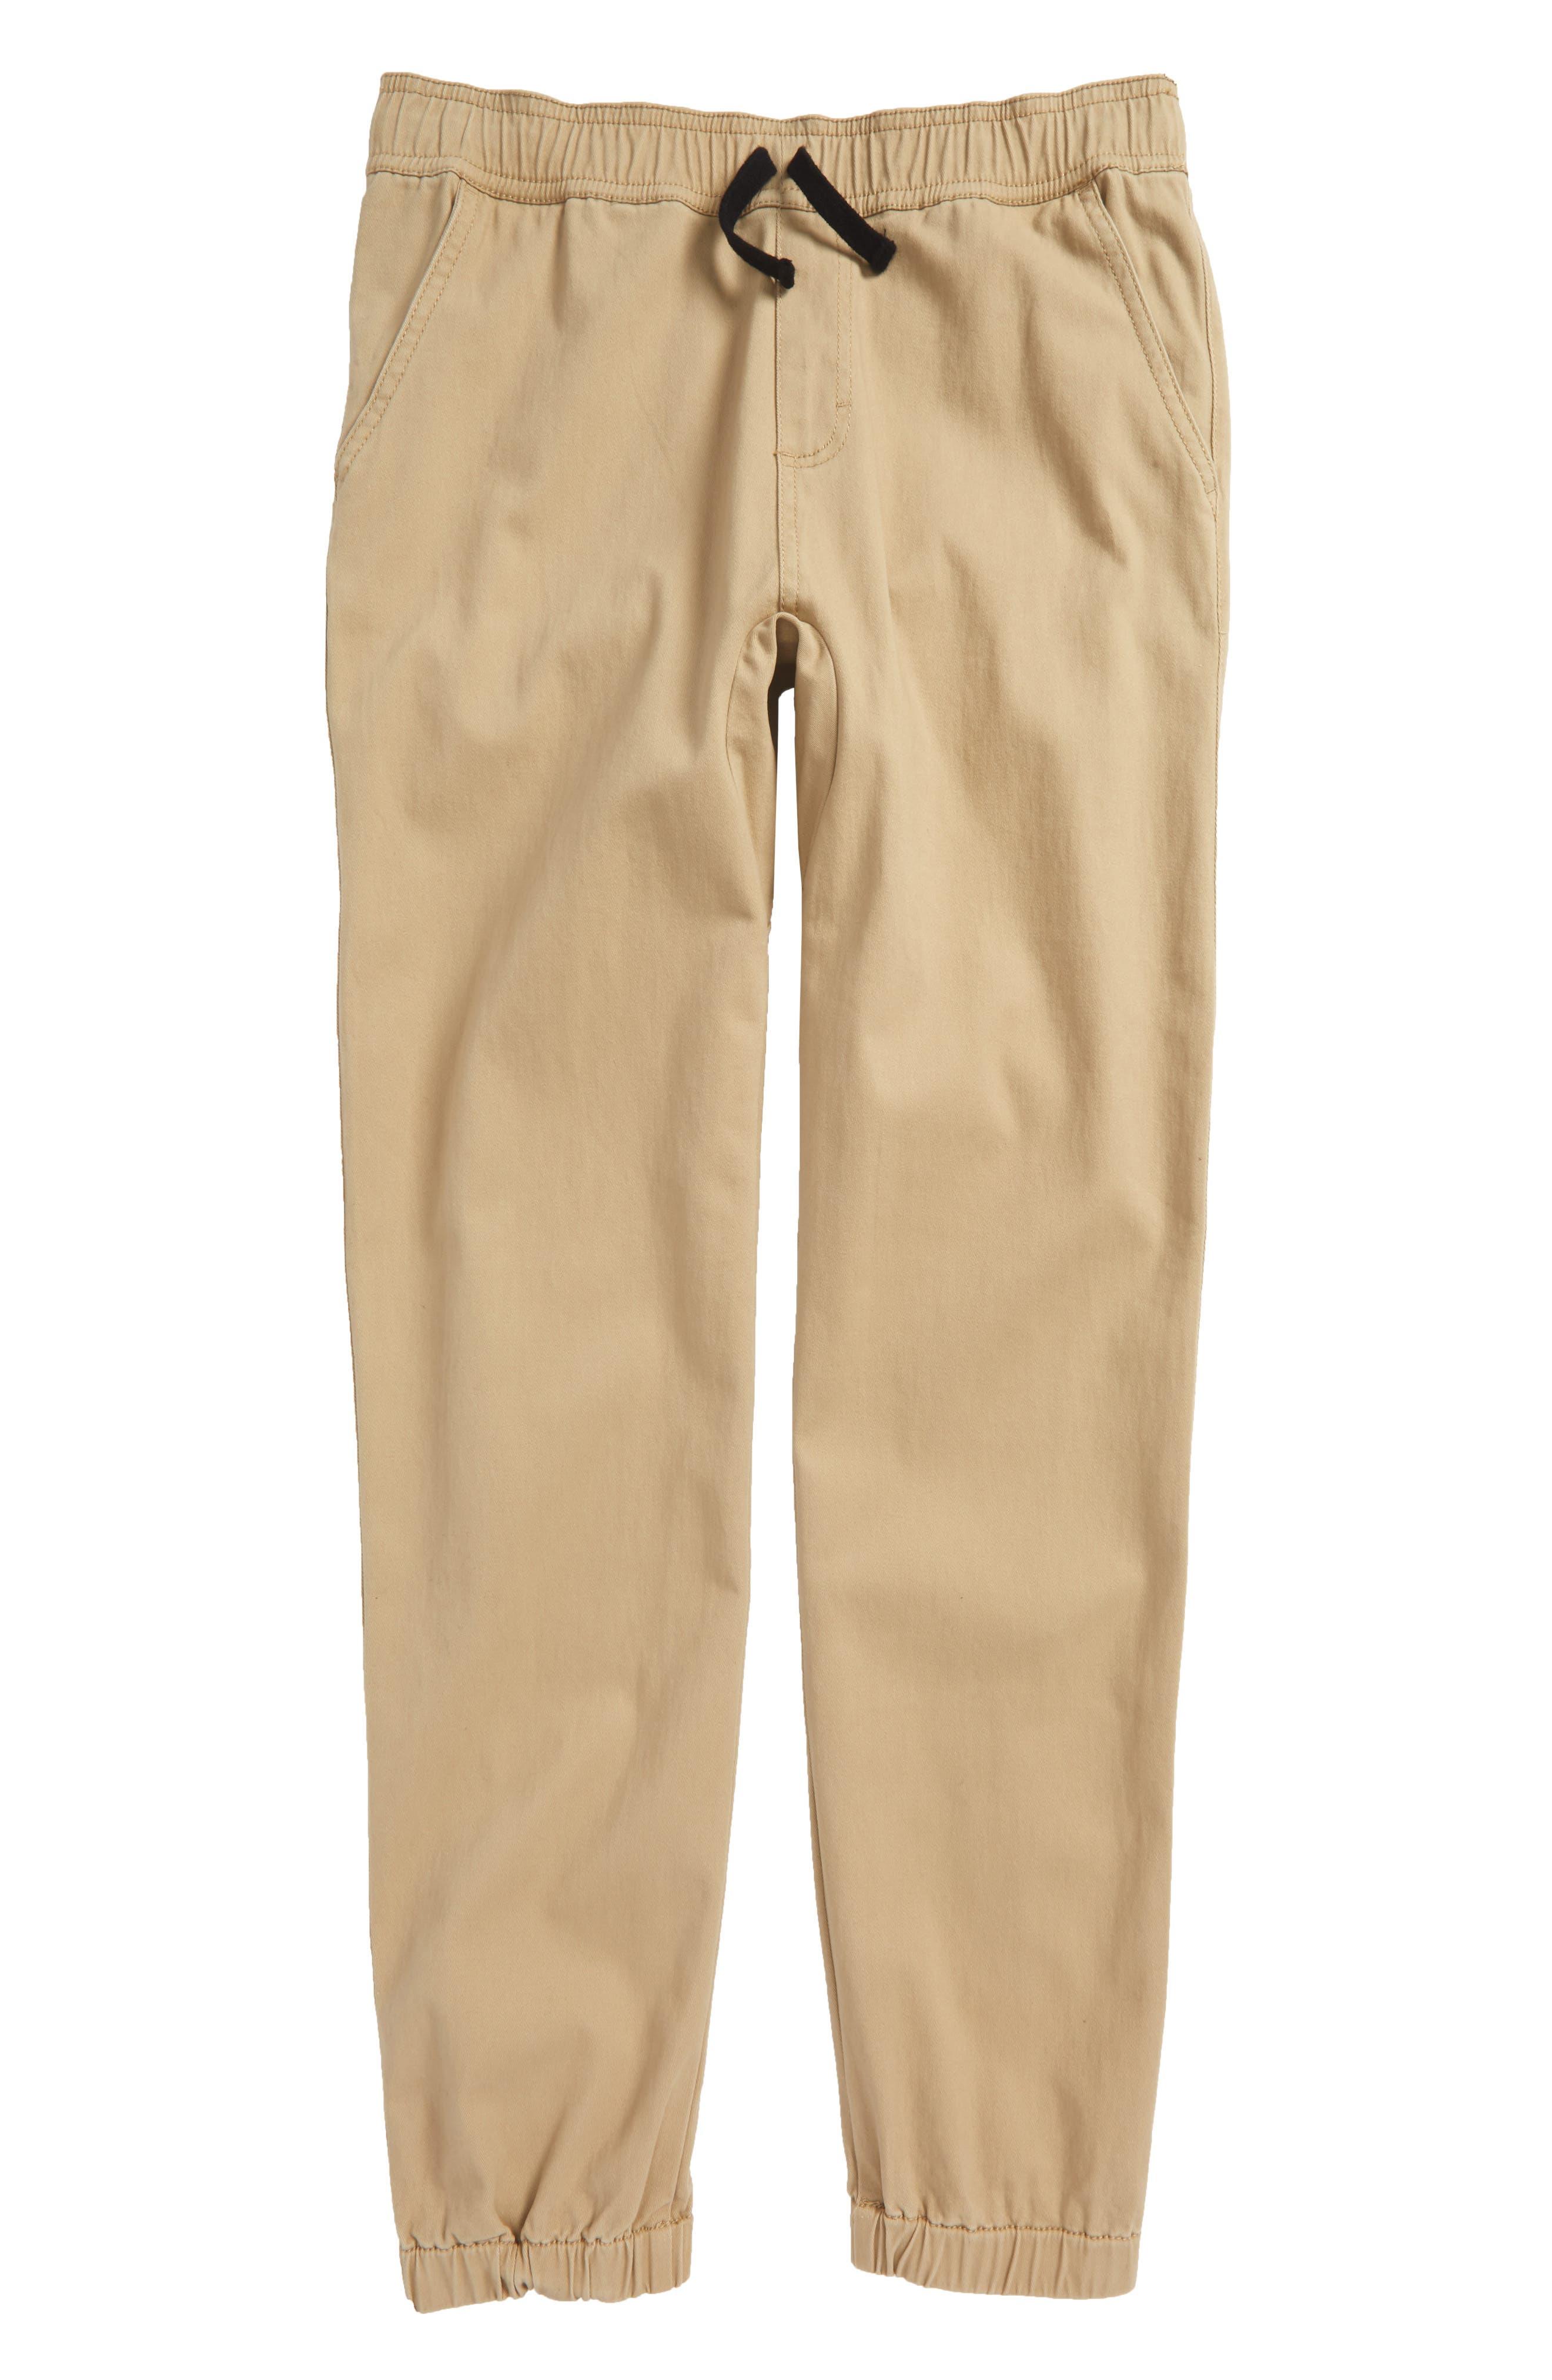 Woven Jogger Pants,                             Main thumbnail 1, color,                             230